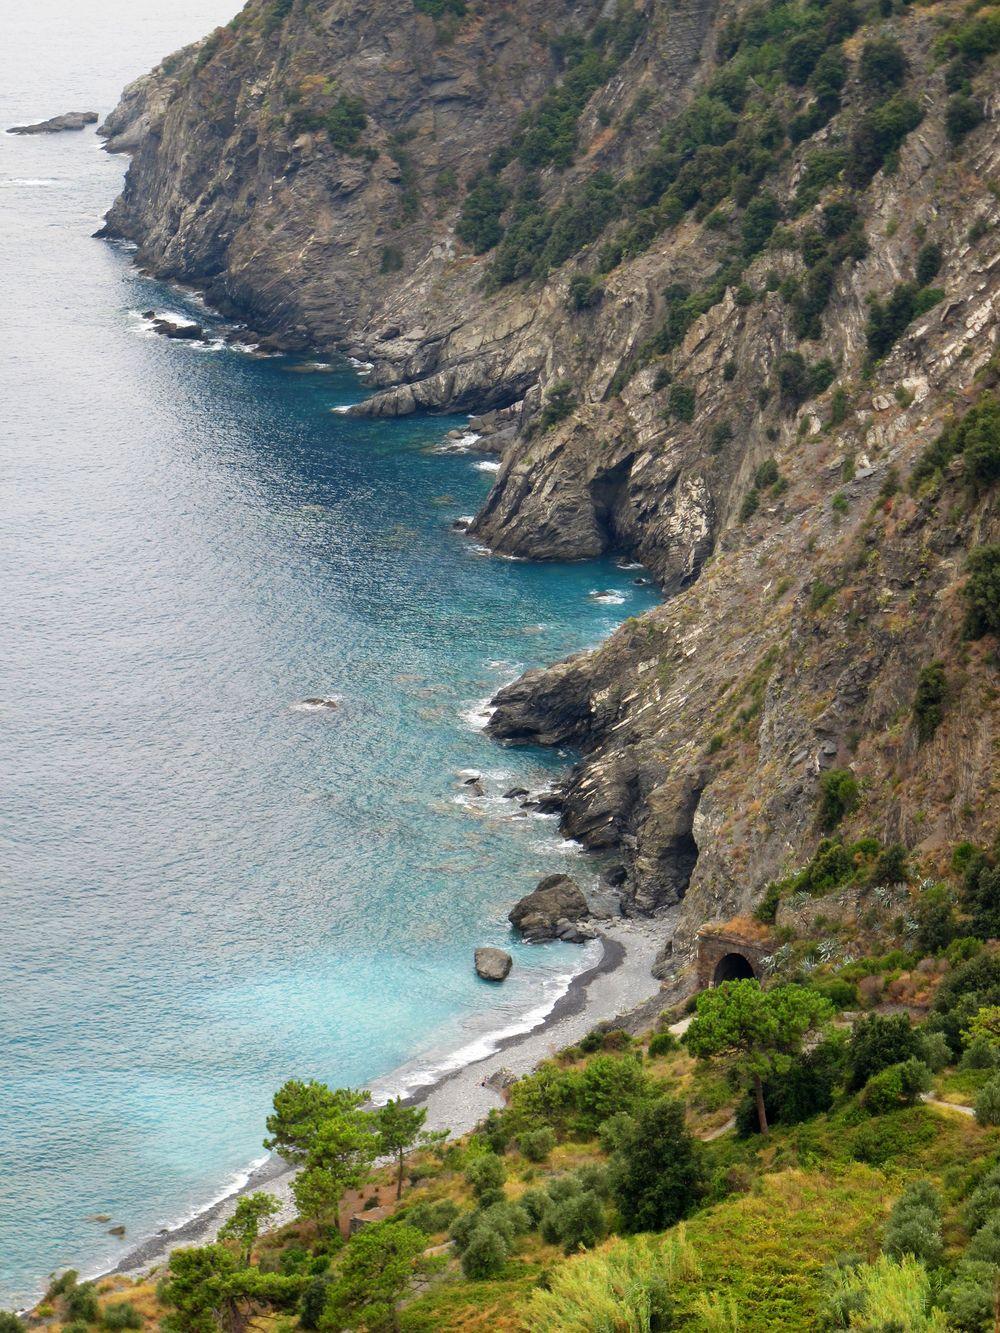 r cliffs.jpg